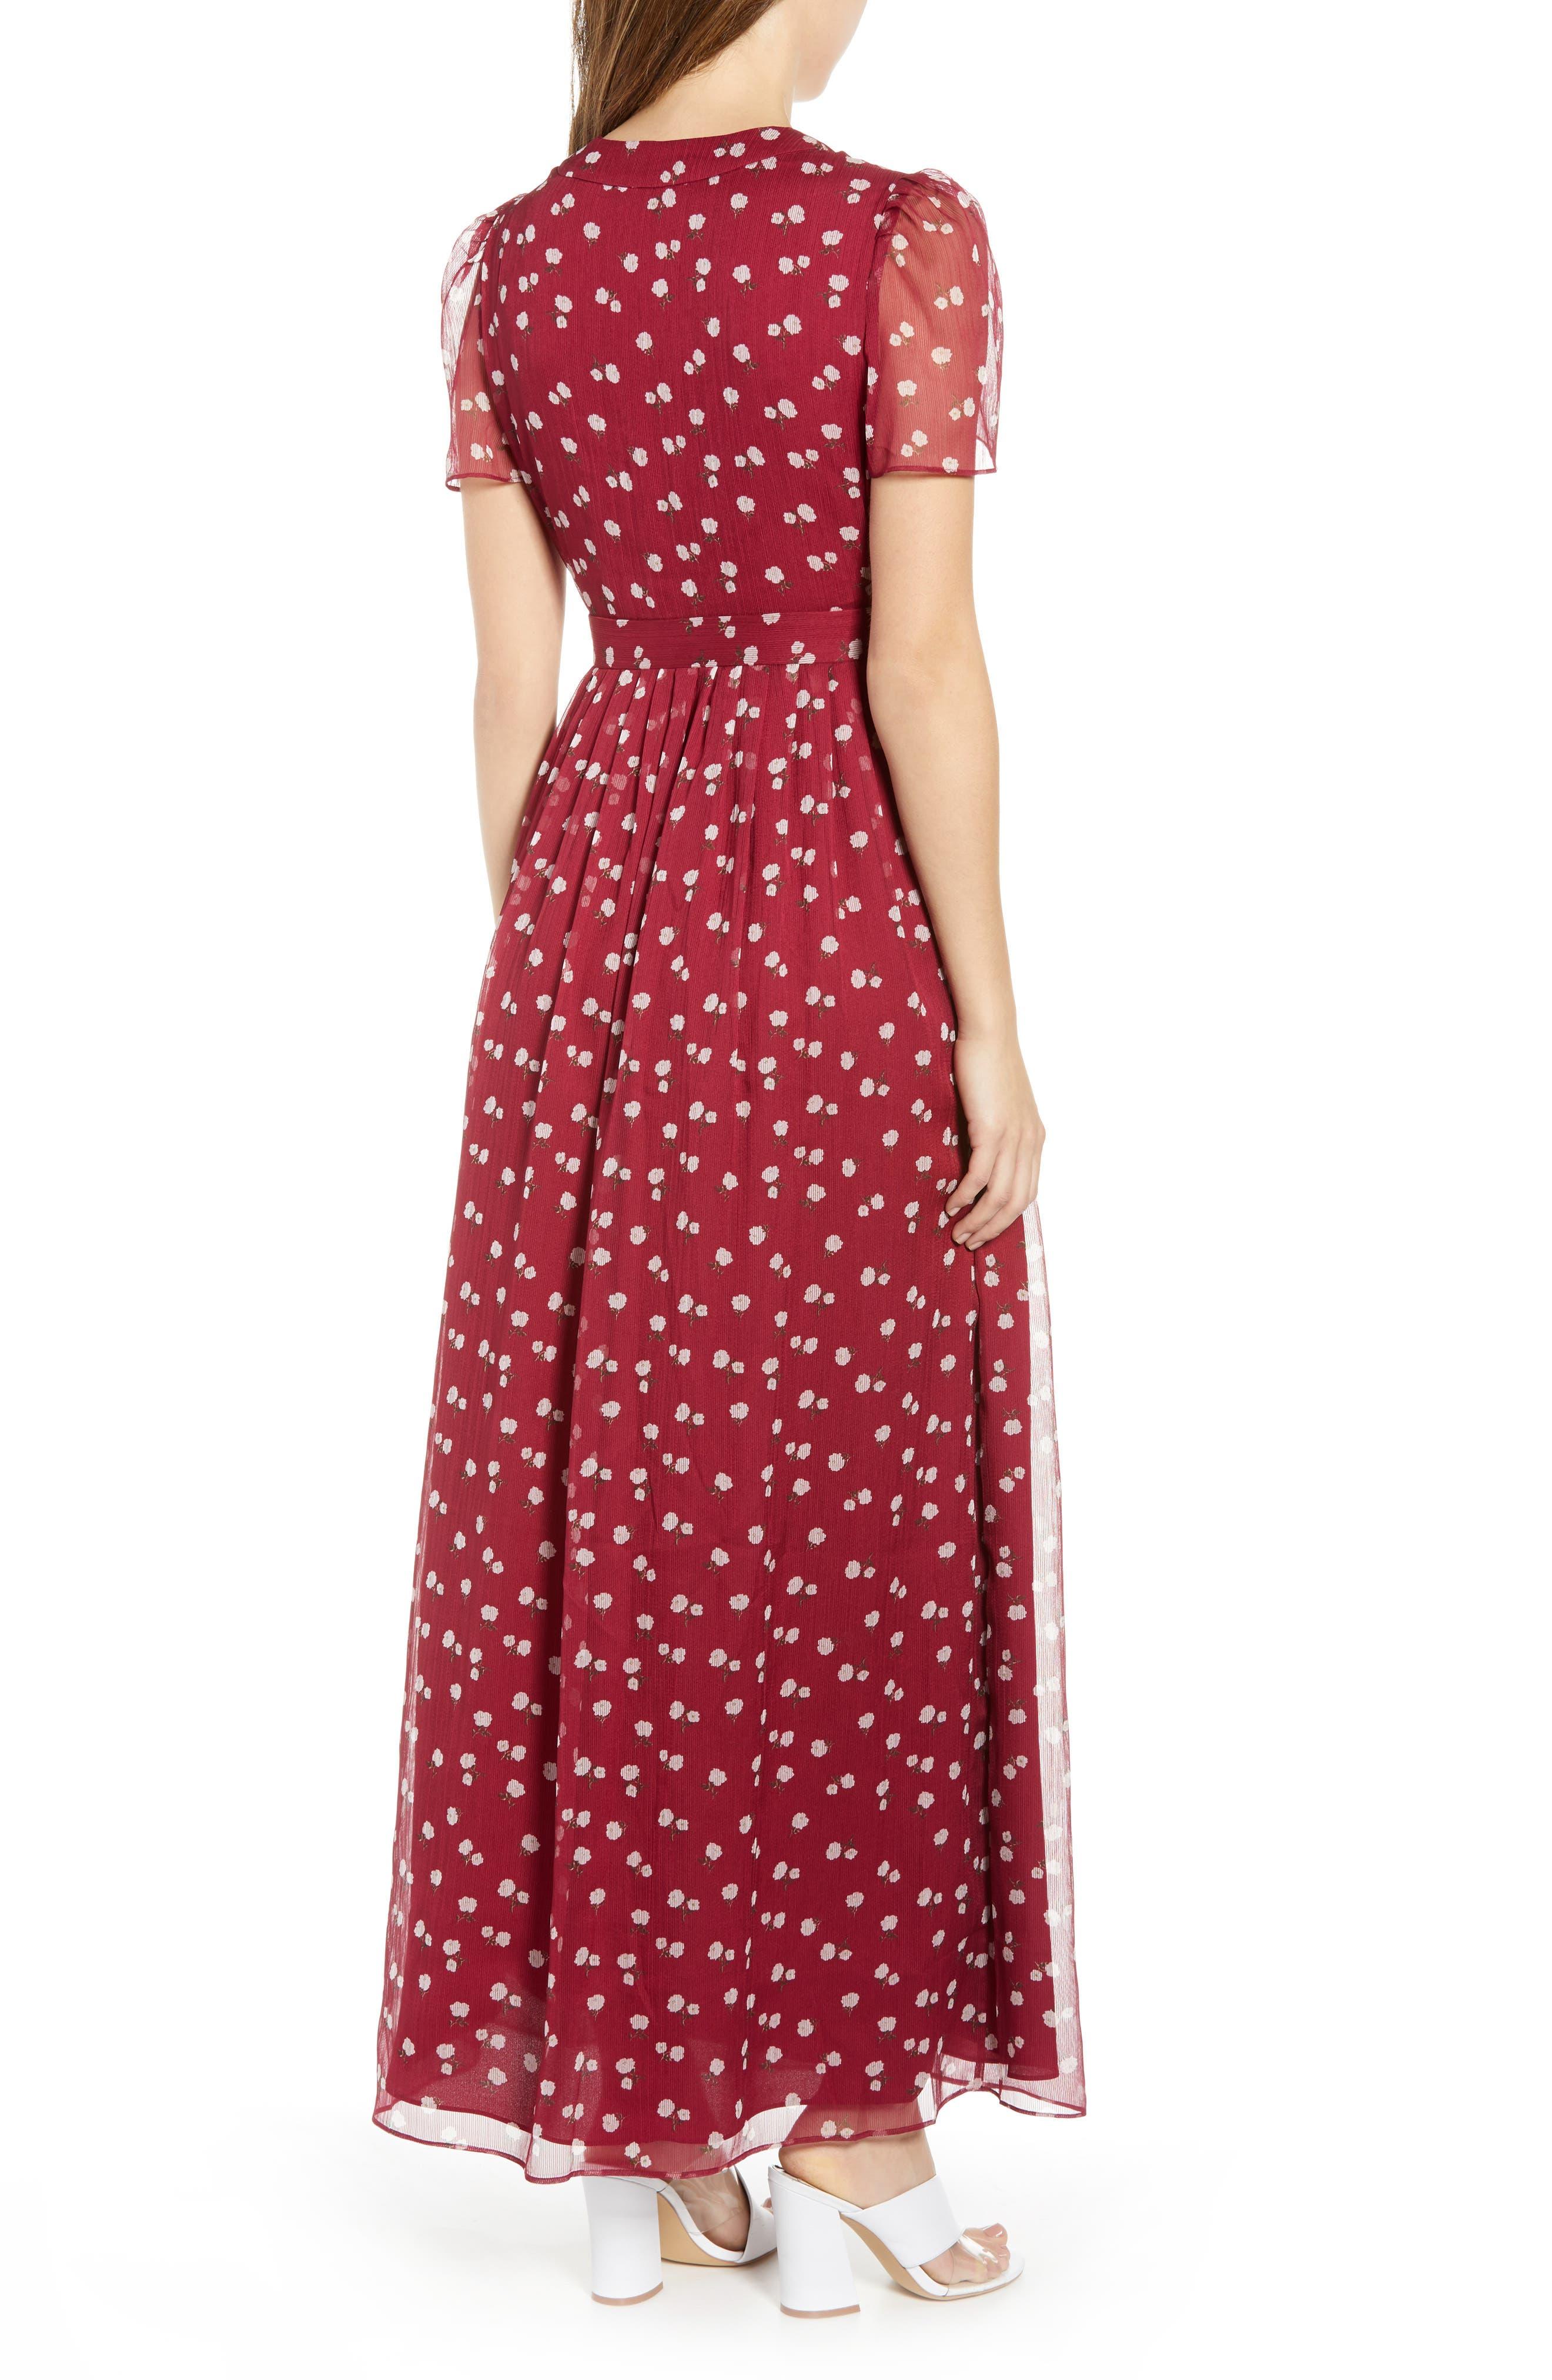 Rhoda Pleated Maxi Dress,                             Alternate thumbnail 2, color,                             BERRY MINI ROSES